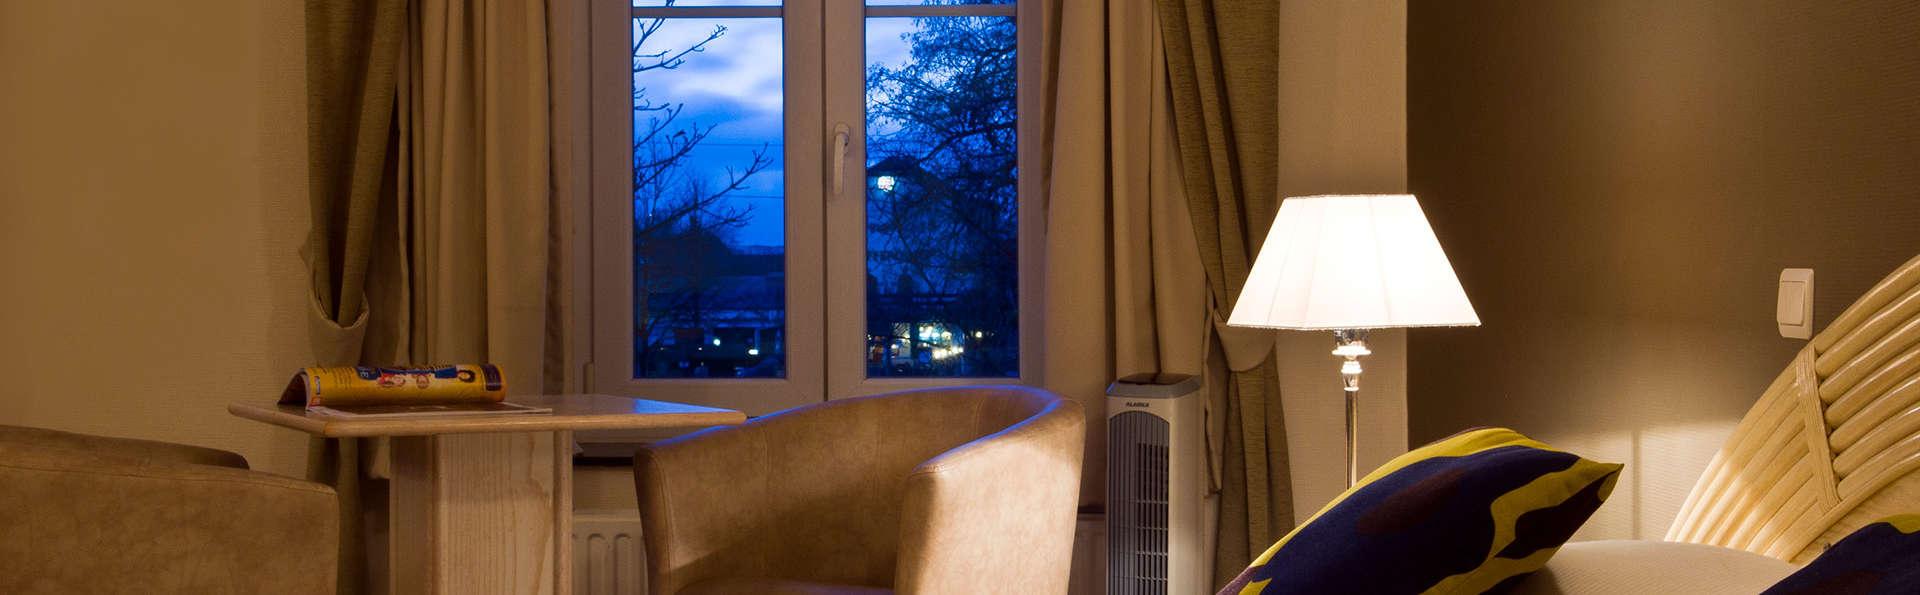 Cocoon Hotel Grenier des Grottes - EDIT_room5.jpg